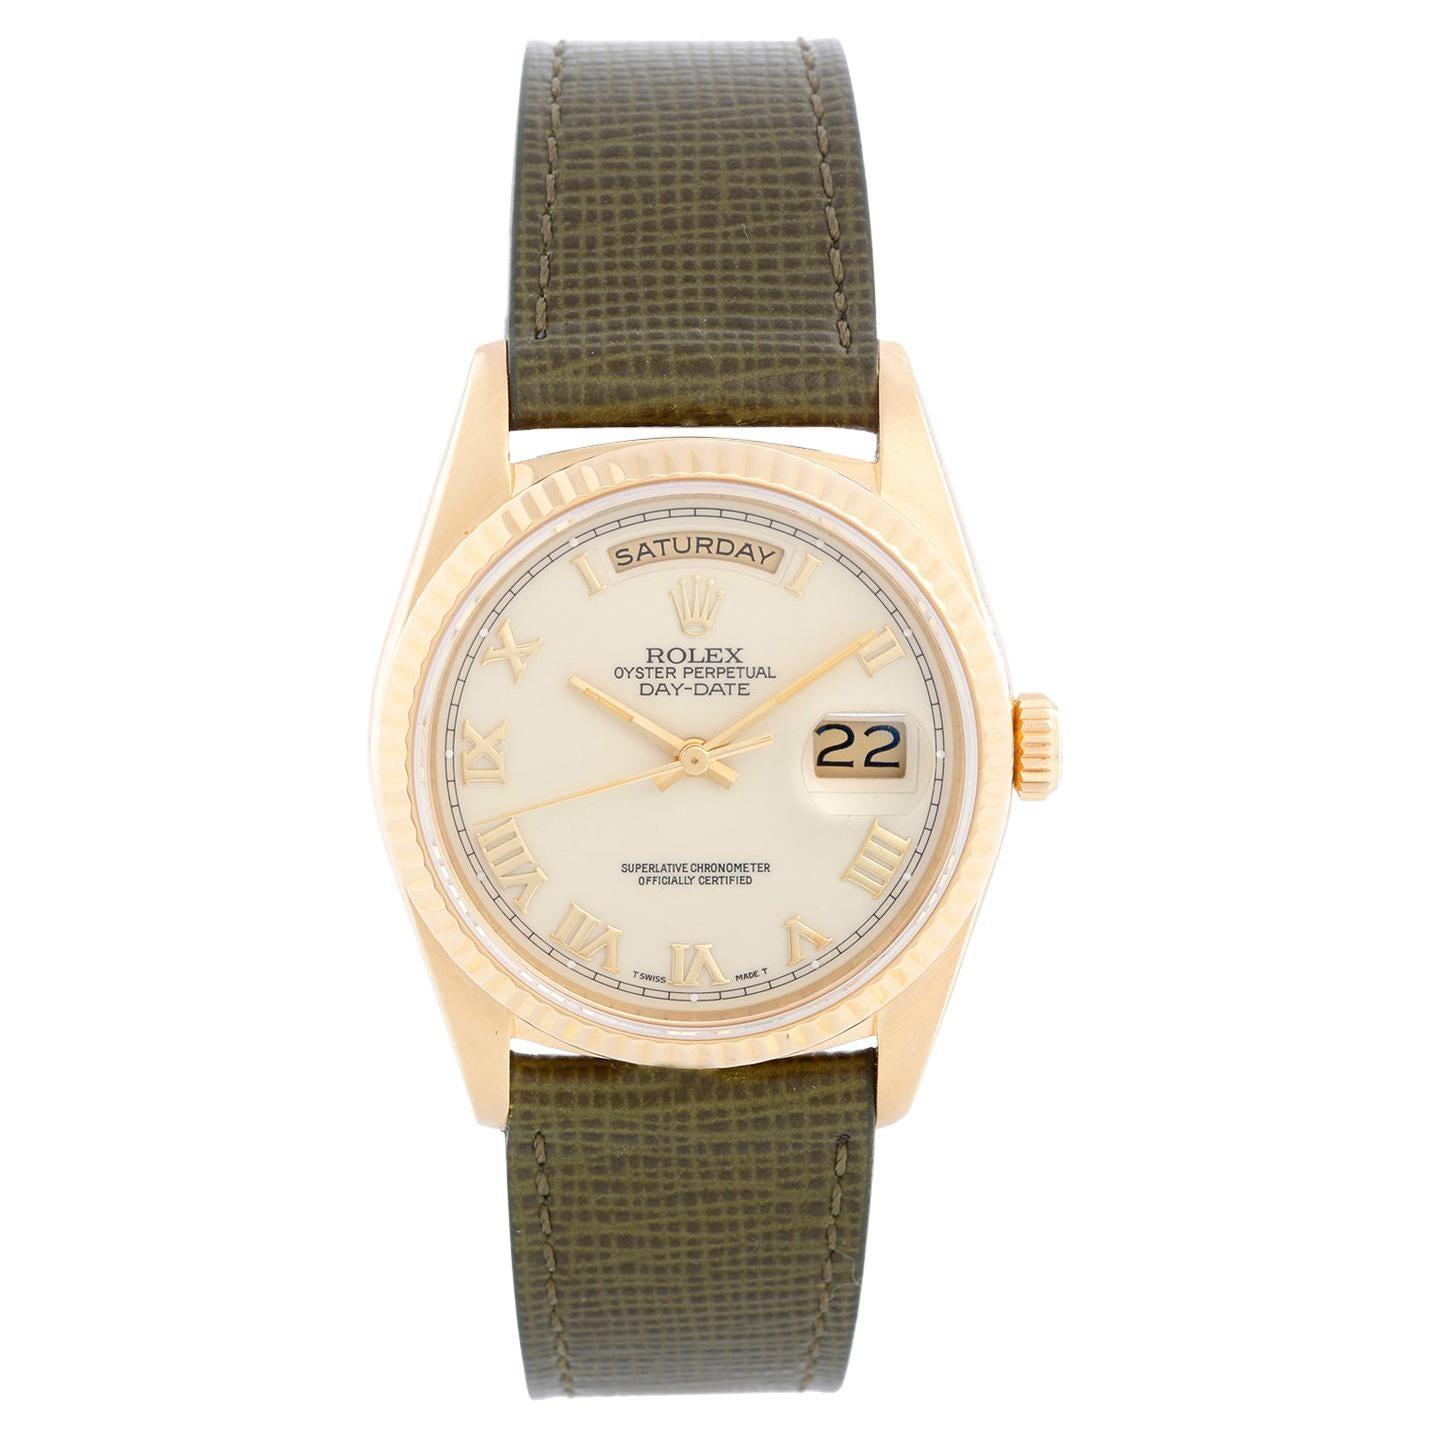 18k Gold Rolex President Day-Date Men's Watch 18238 Cream Dial